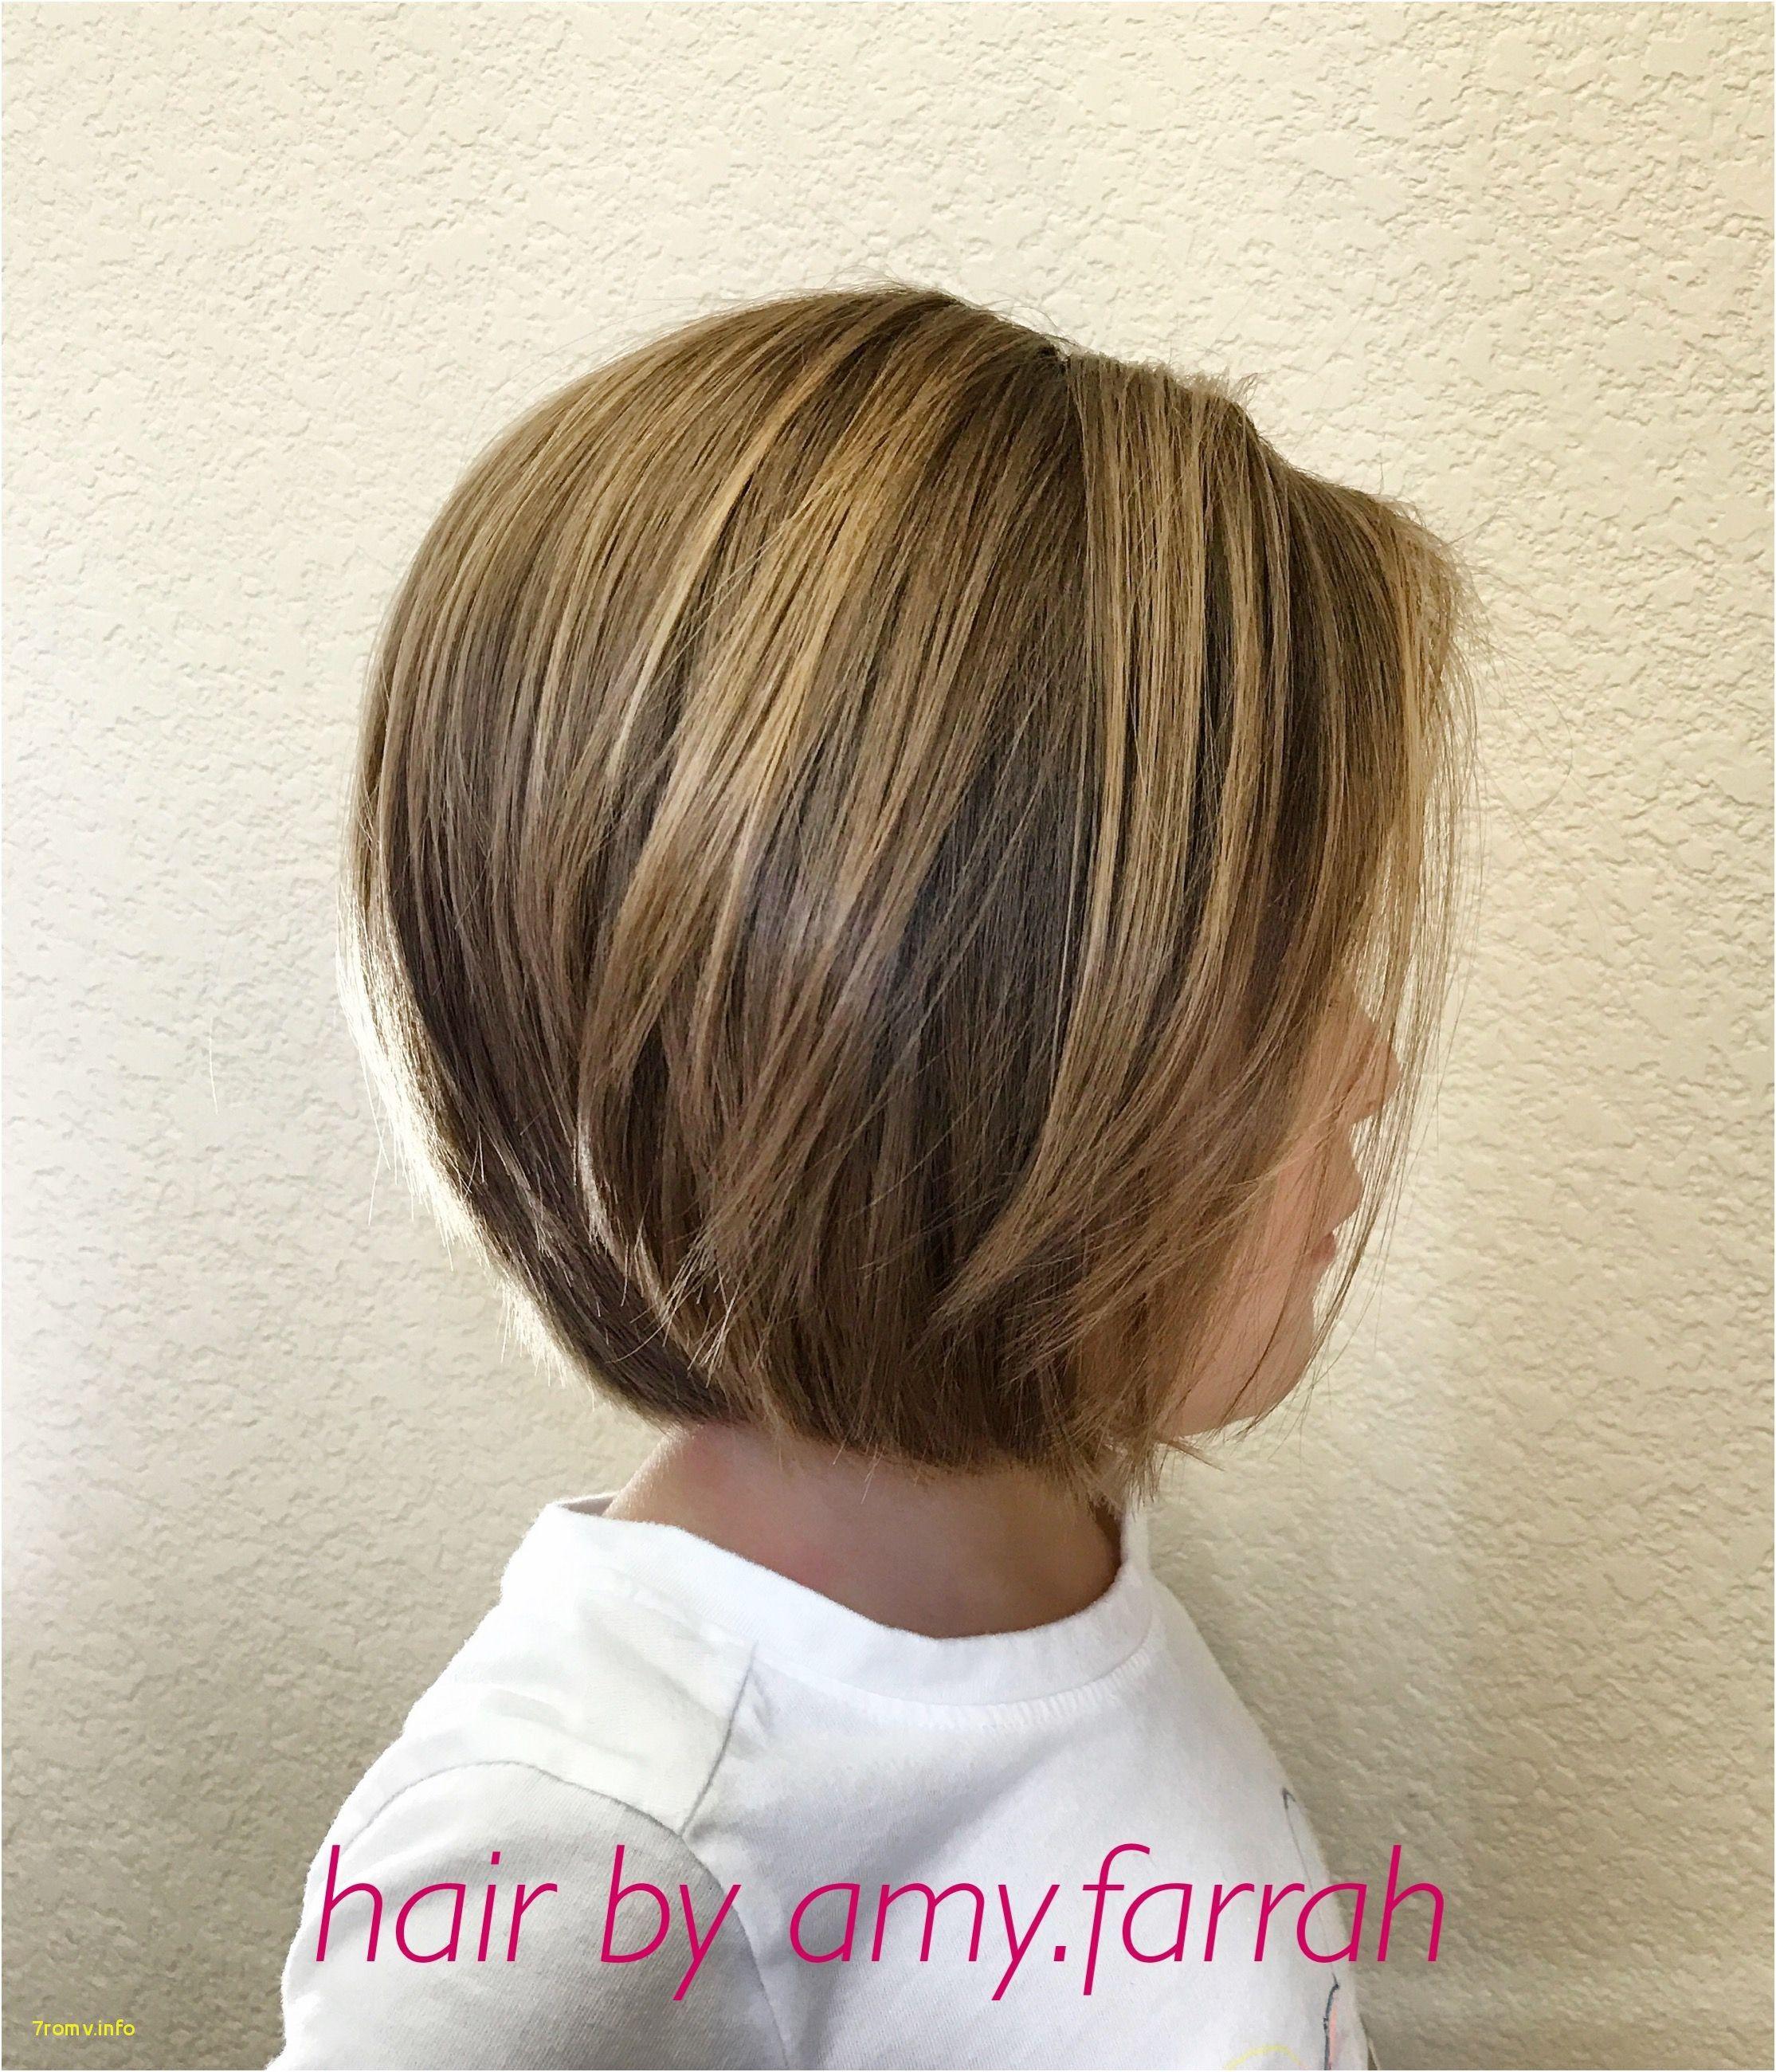 short bob hairstyles for fine hair back view fresh little